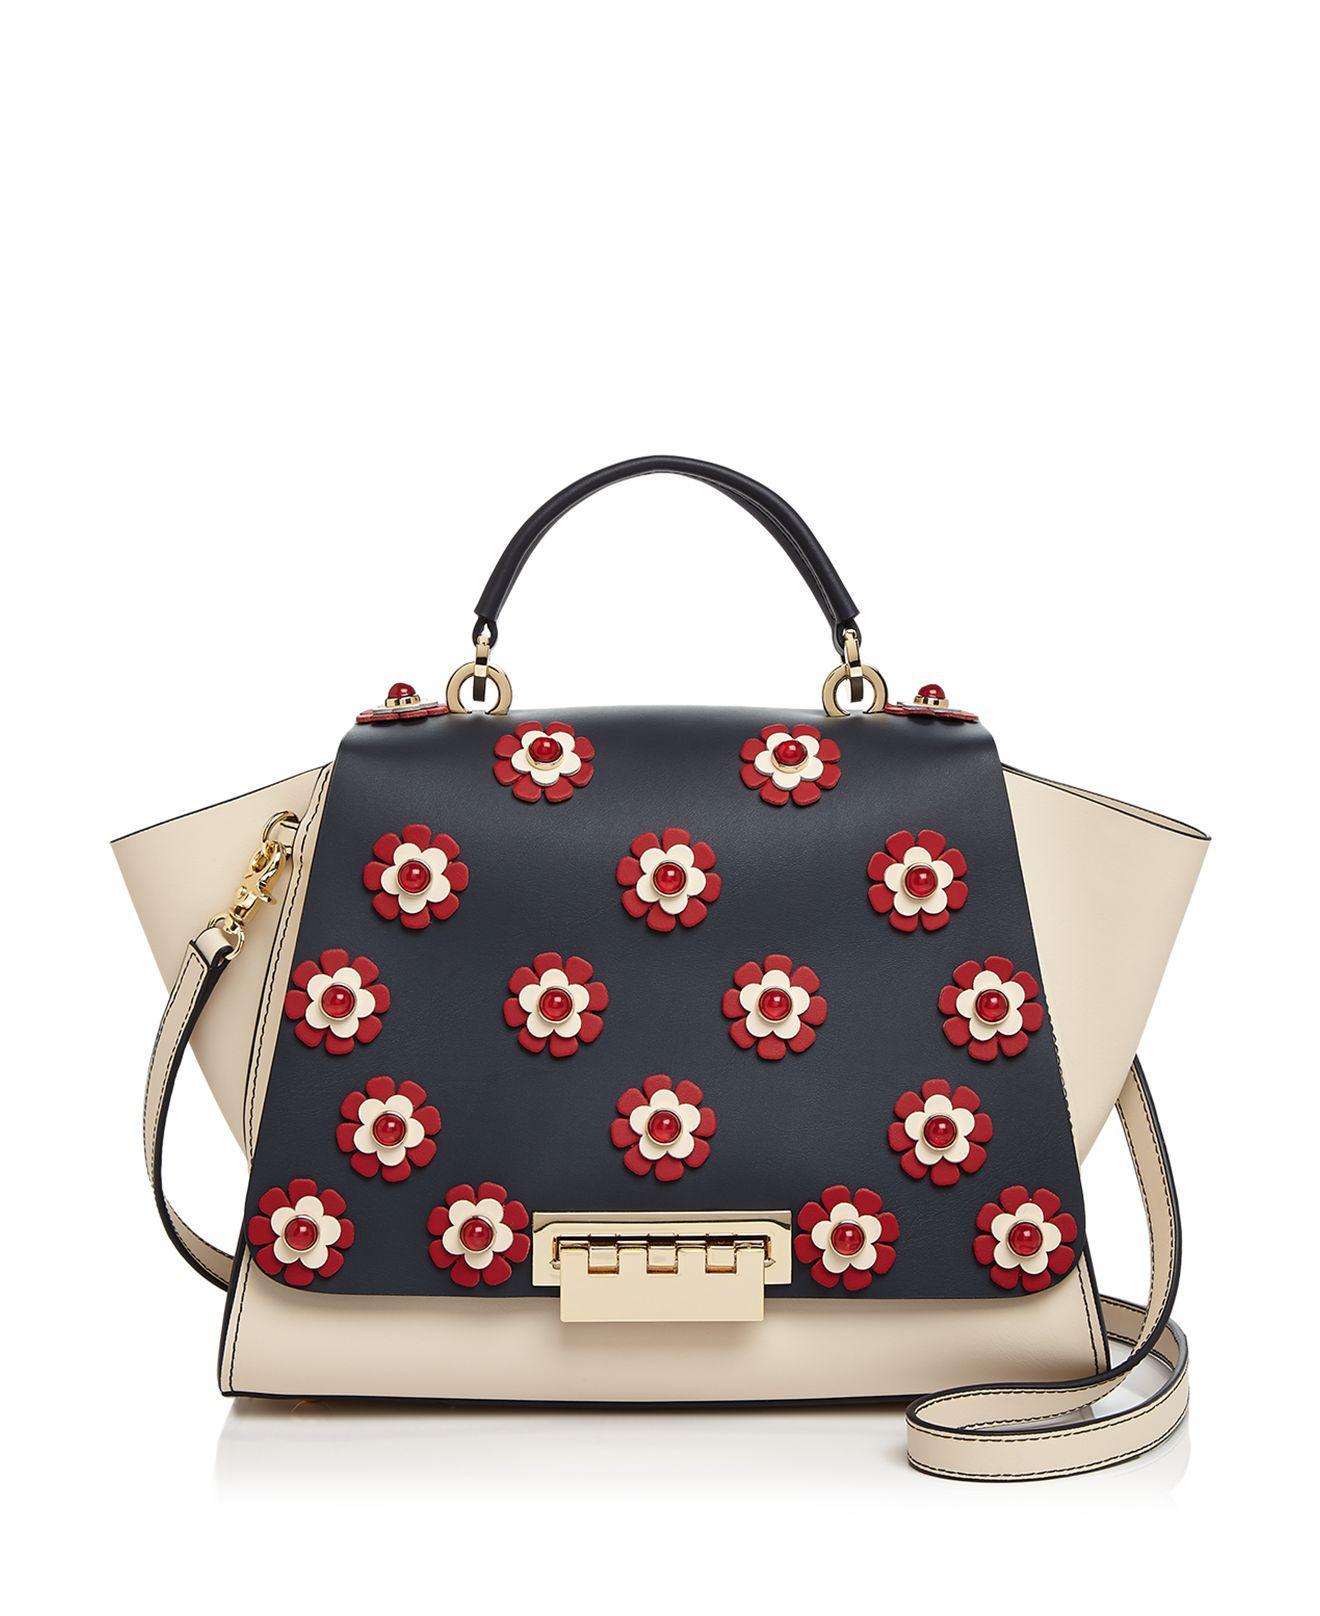 Zac Zac Posen Eartha Iconic Floral Soft Top Handle Leather